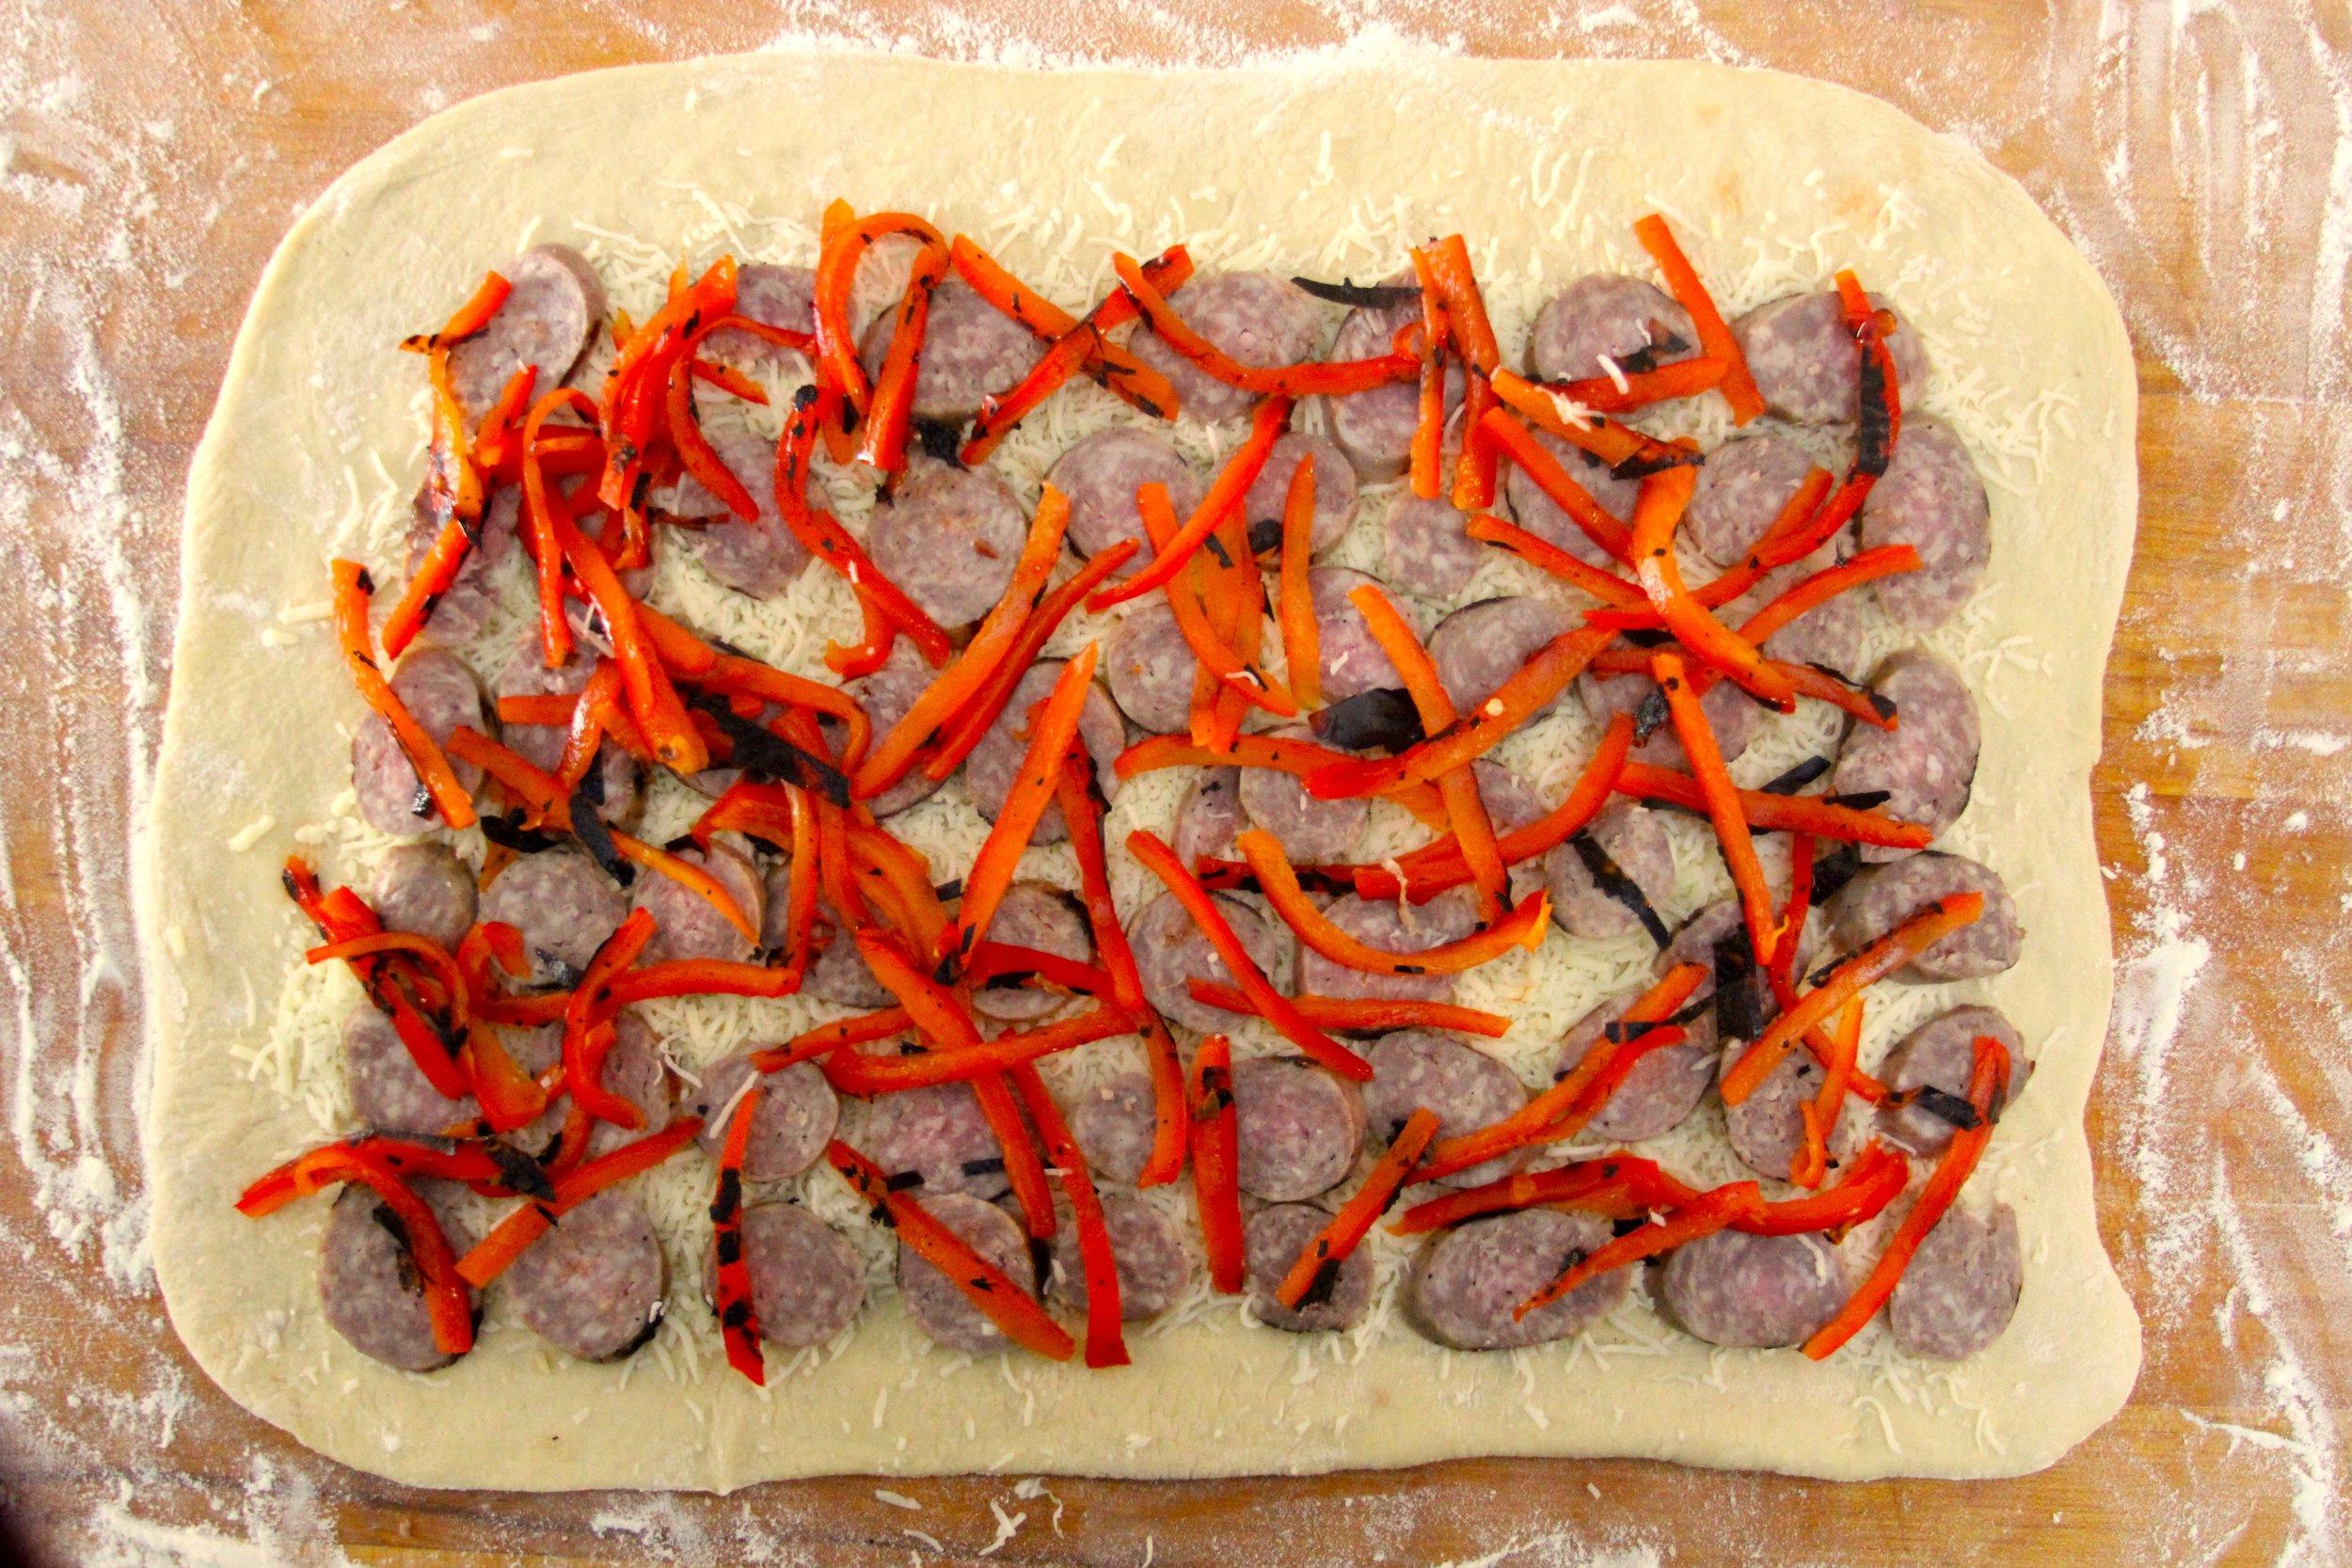 Preparing the Stromboli